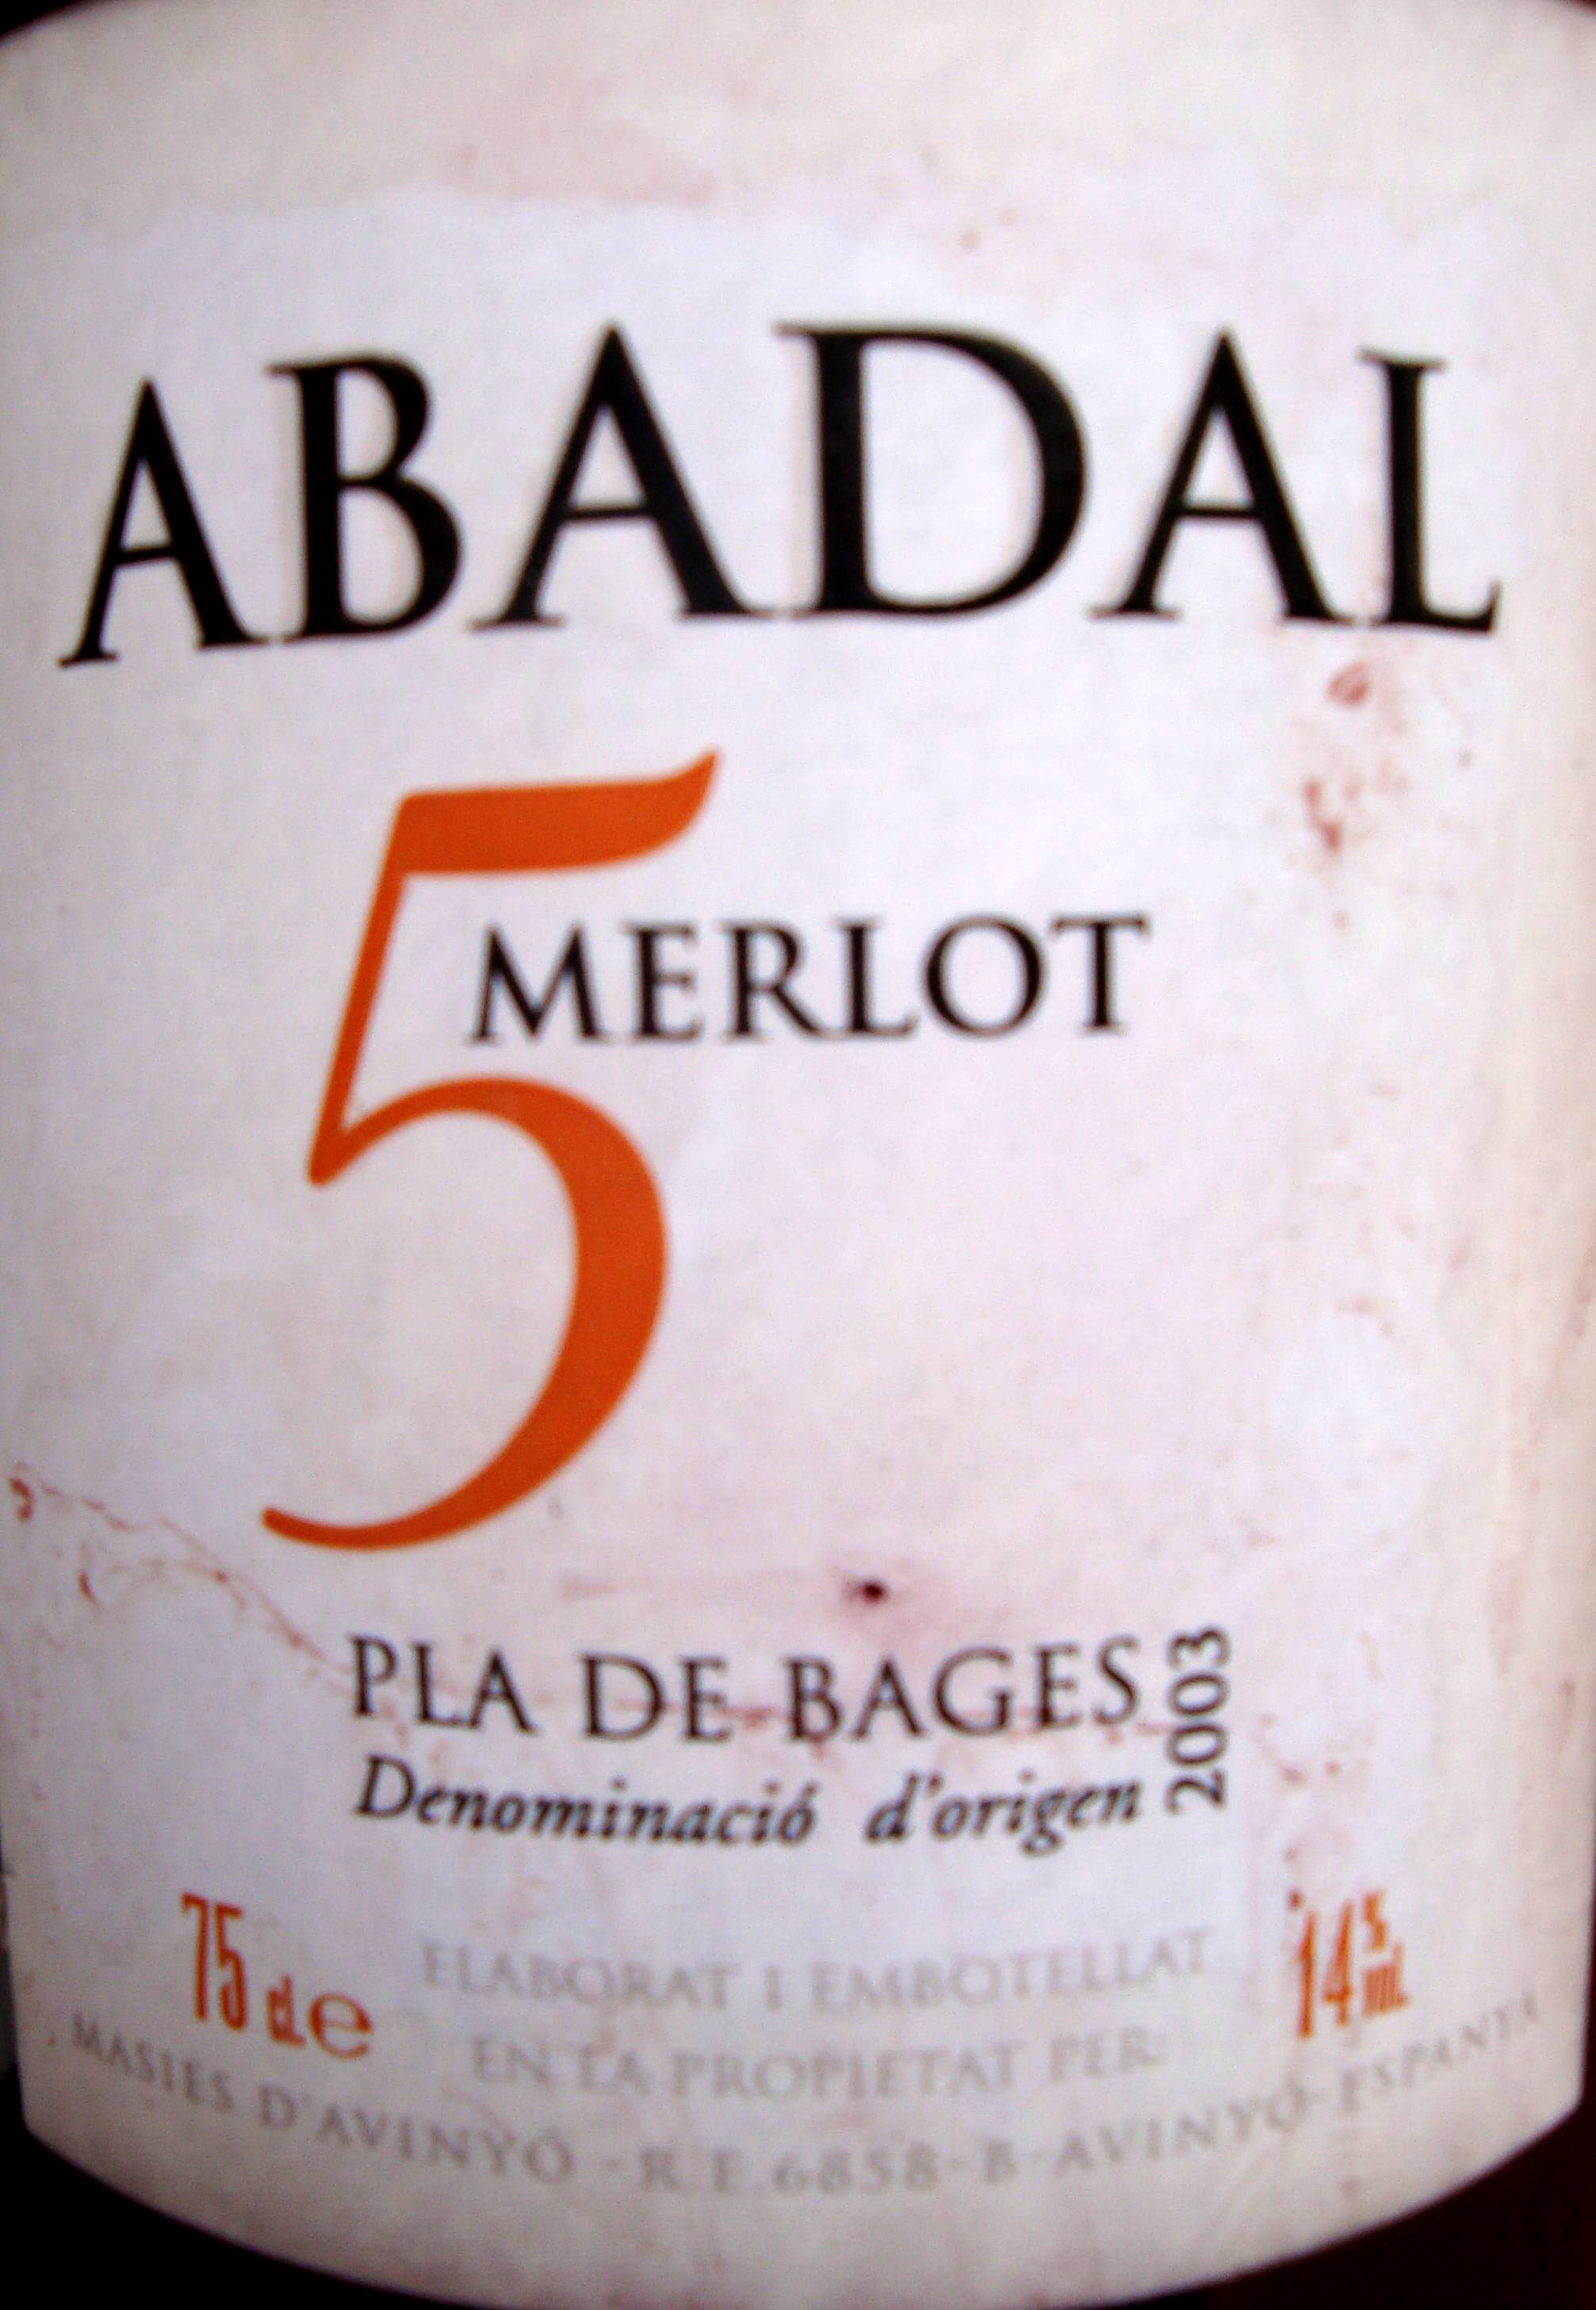 Label Abadal 5